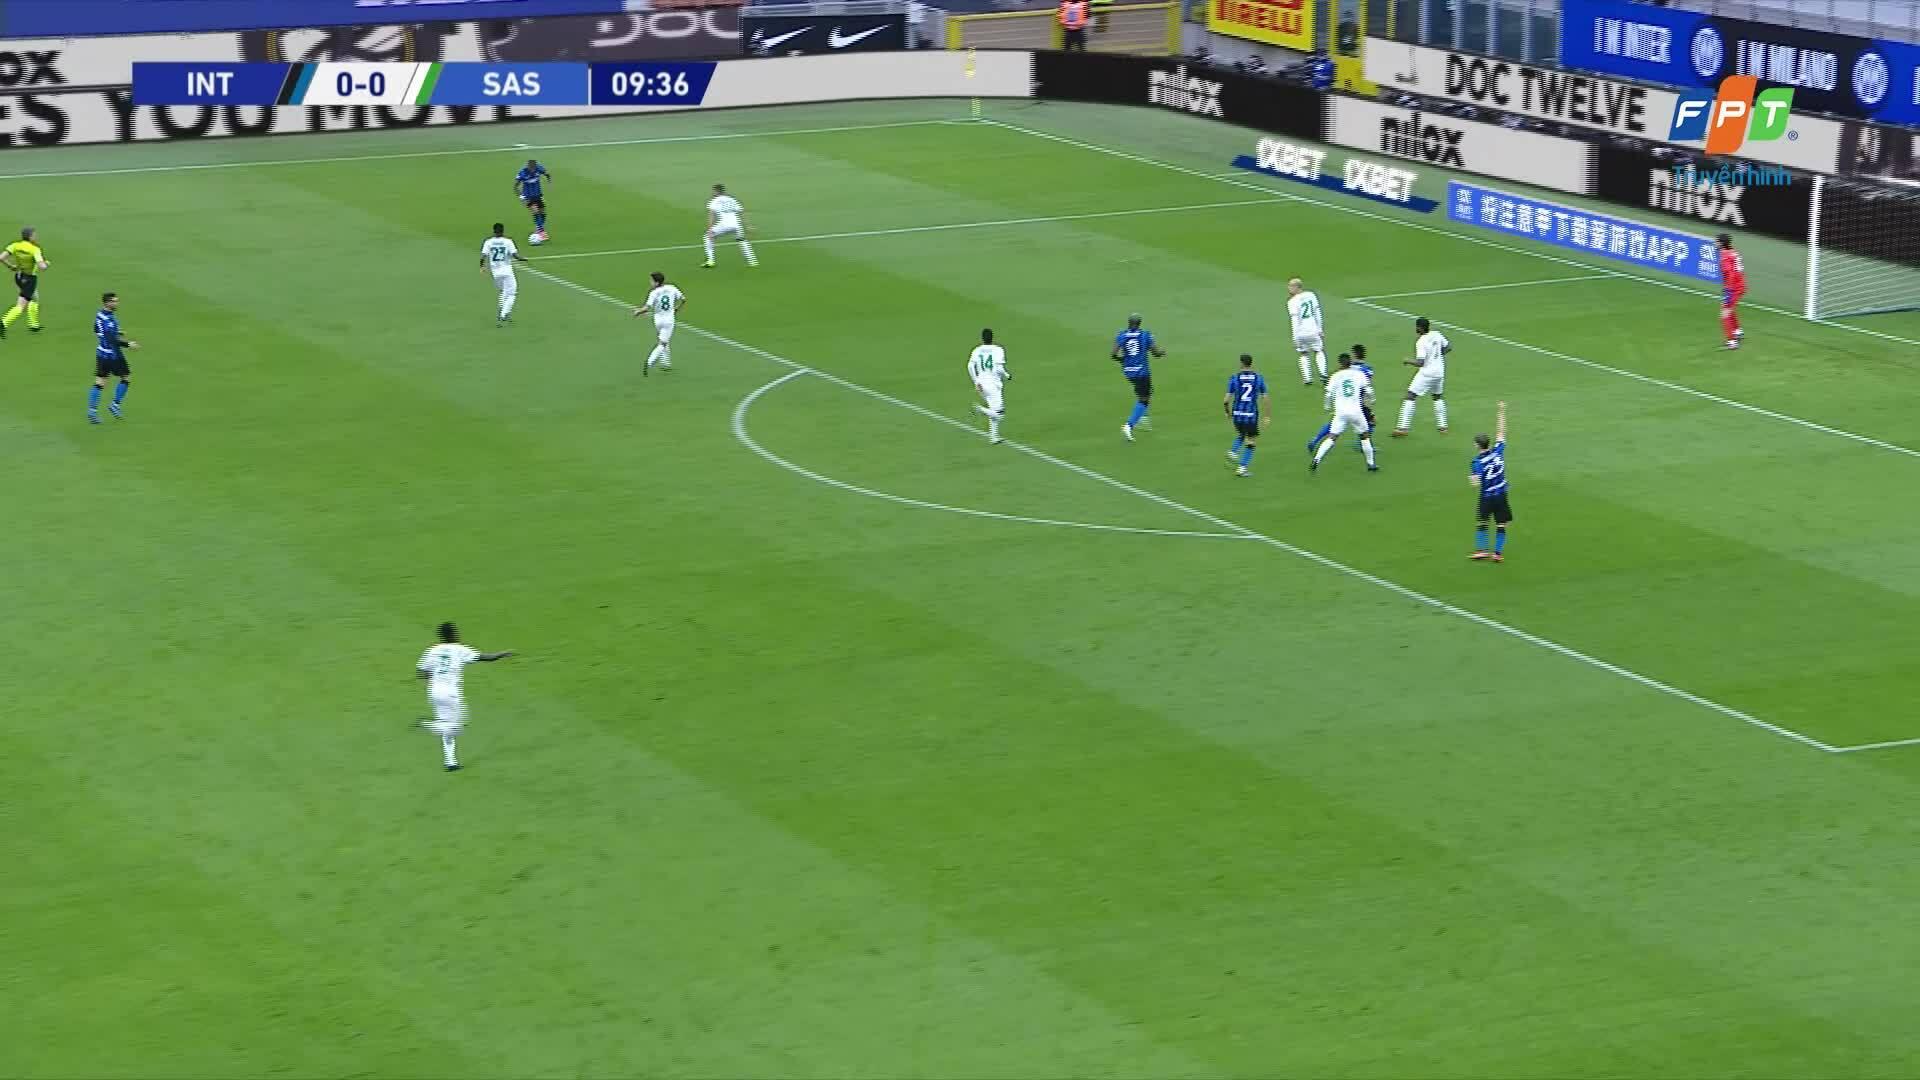 HASIL Inter vs Sassuolo Liga Italia - Duet LuLa Bikin ...  |Inter- Sassuolo